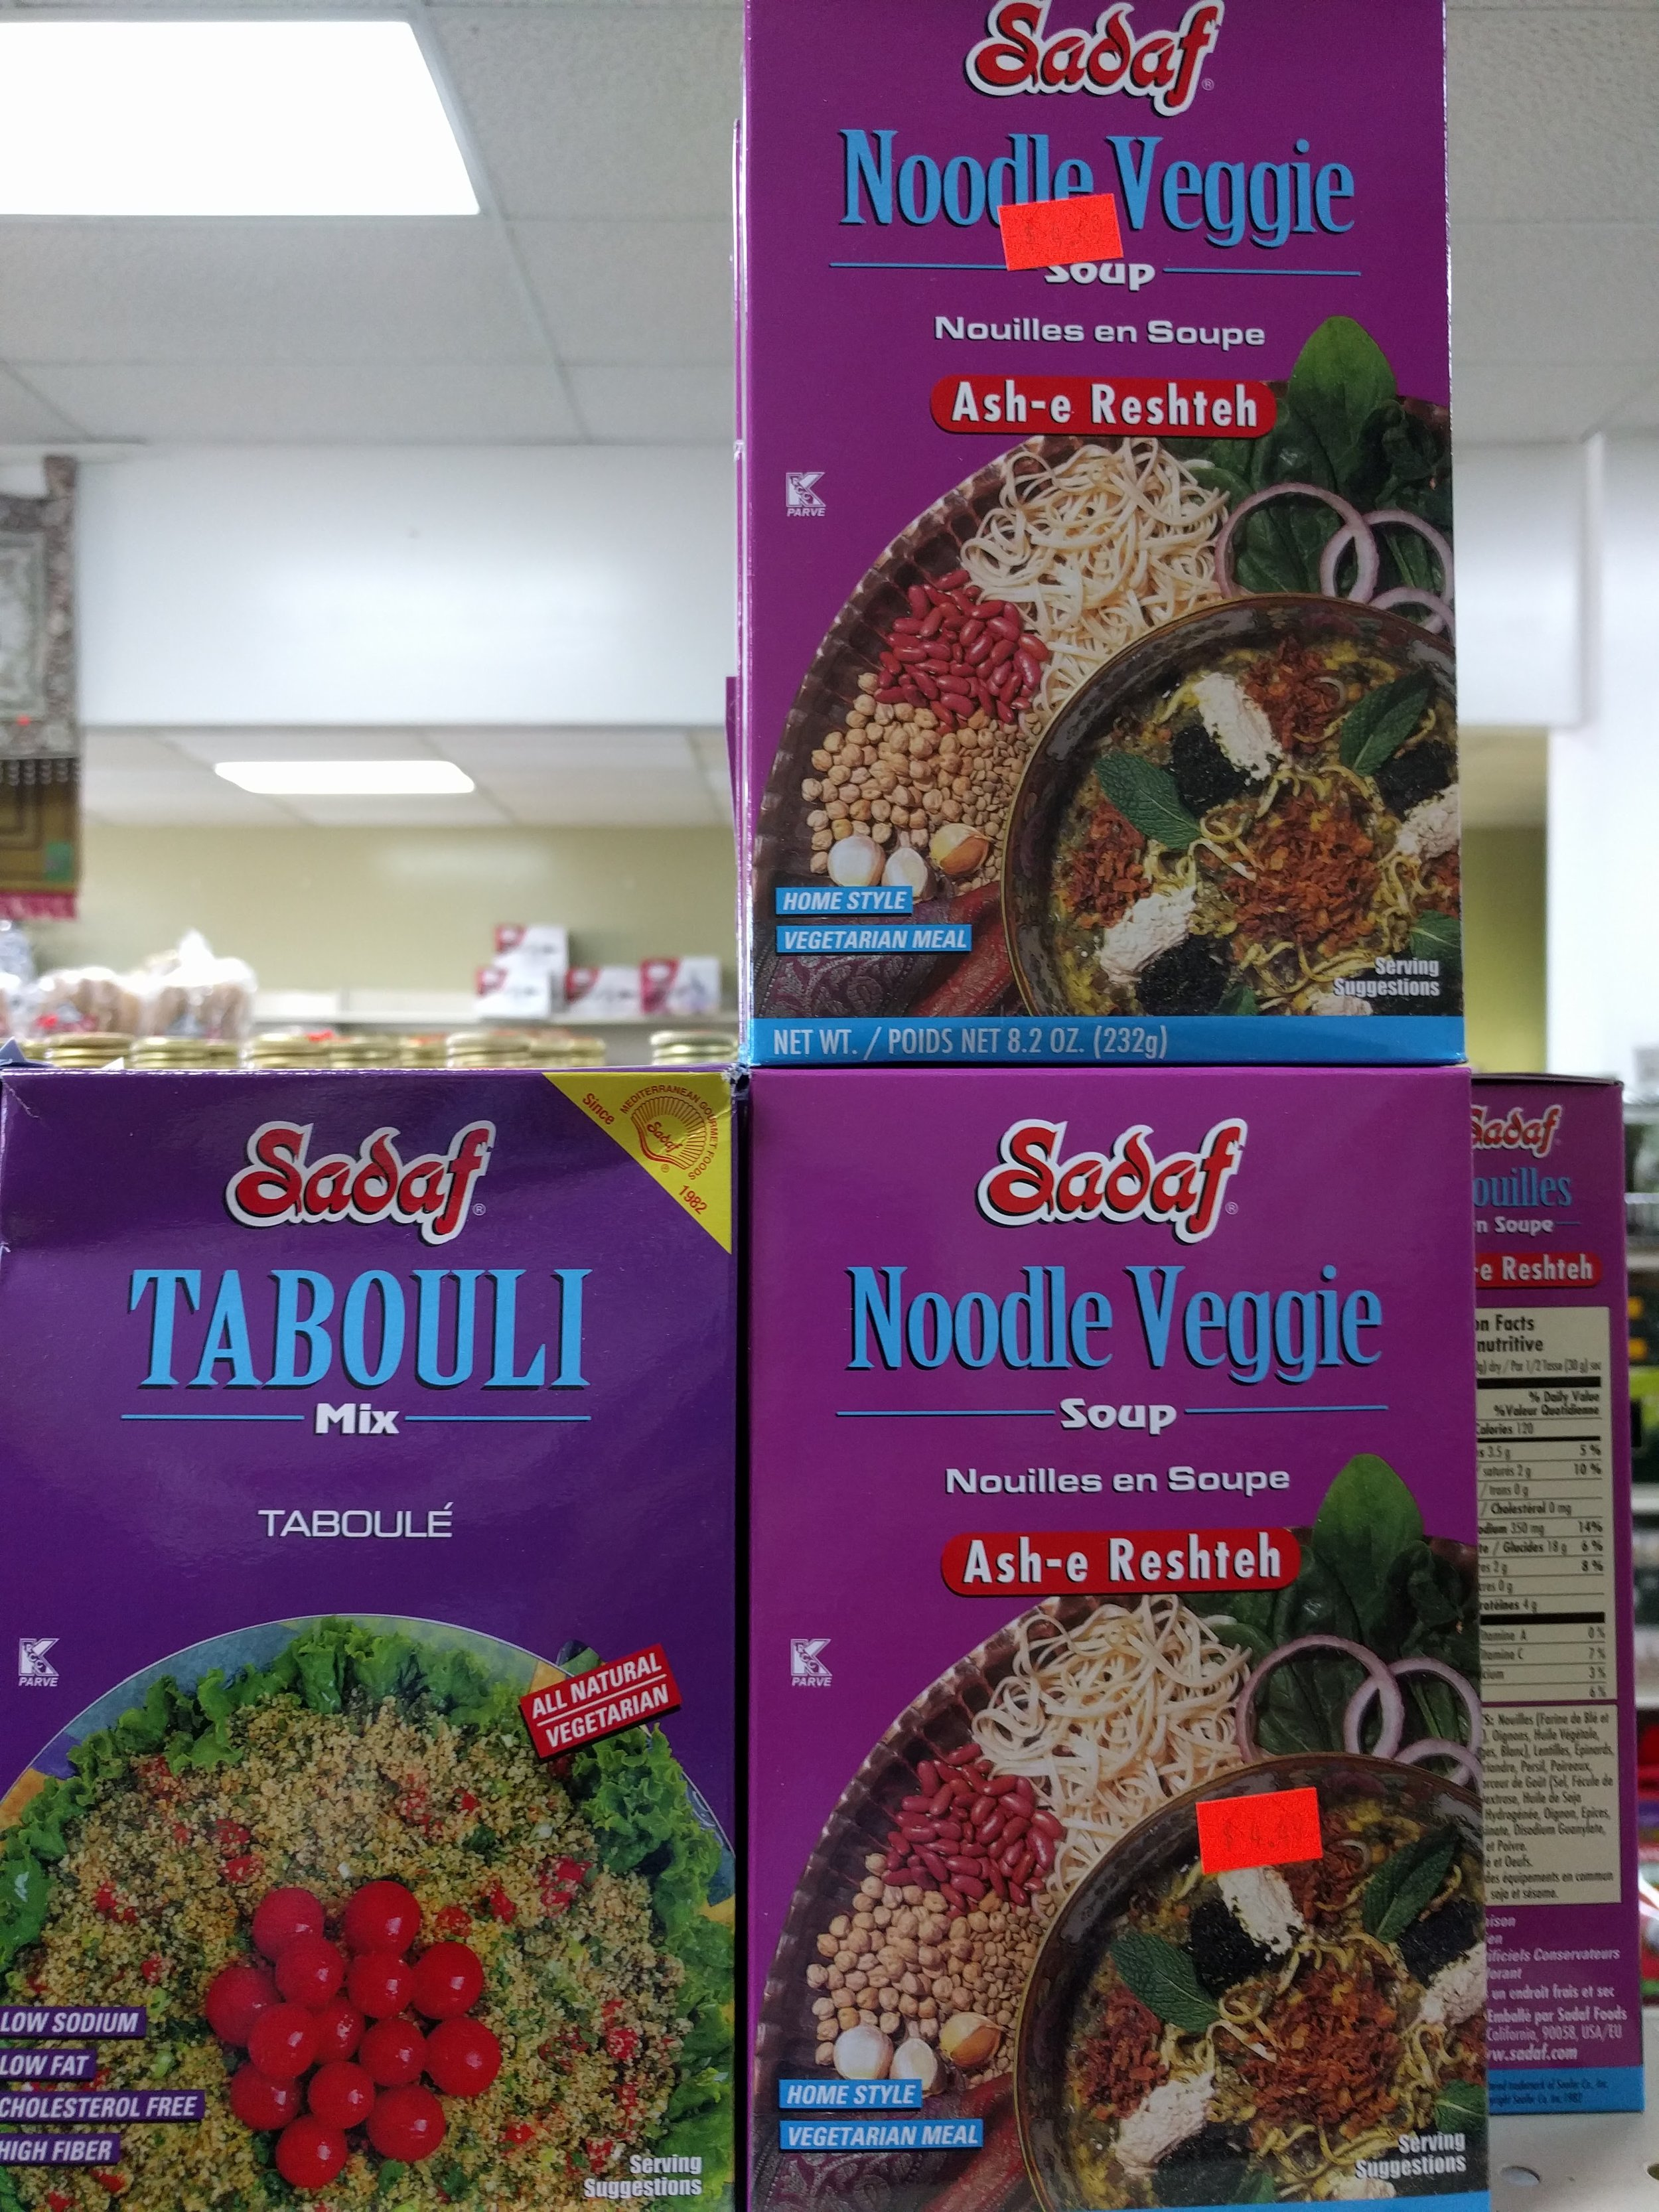 Sadaf-Tabouli-Pak-Halal-International-Foods-12259-W-87th-St-Pkwy-Lenexa-KS-66215.jpg